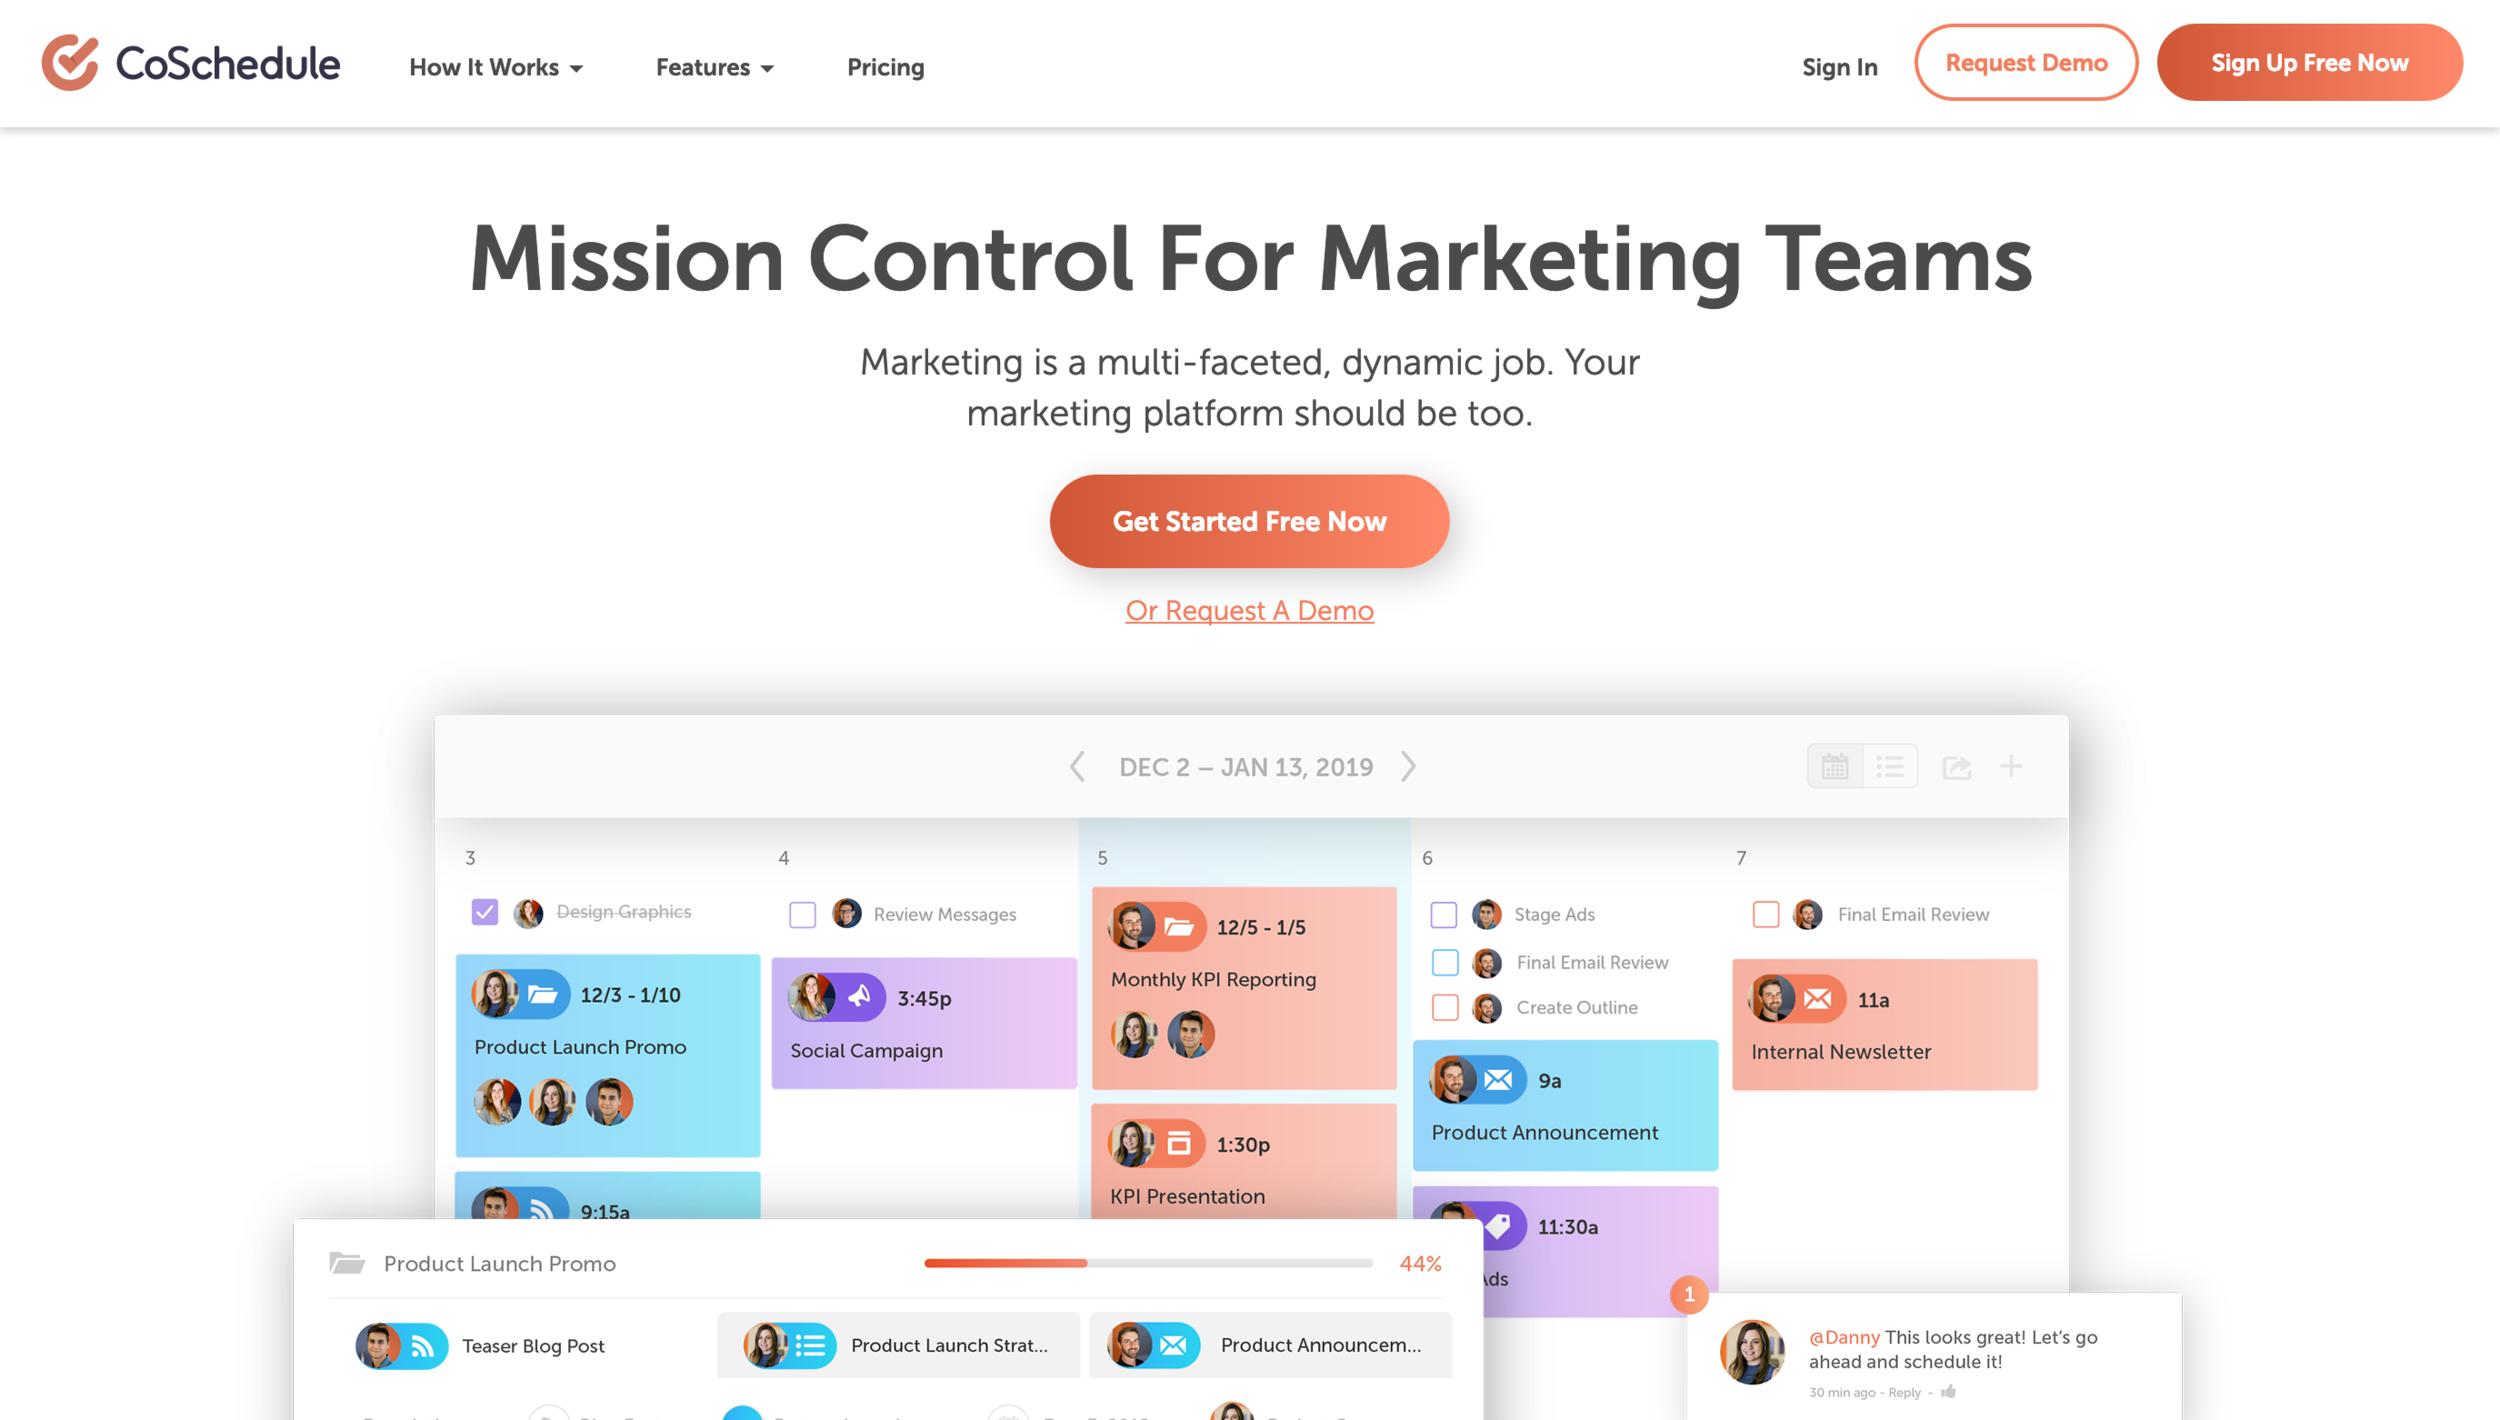 event-marketing-social-media-tools-coschedule.png